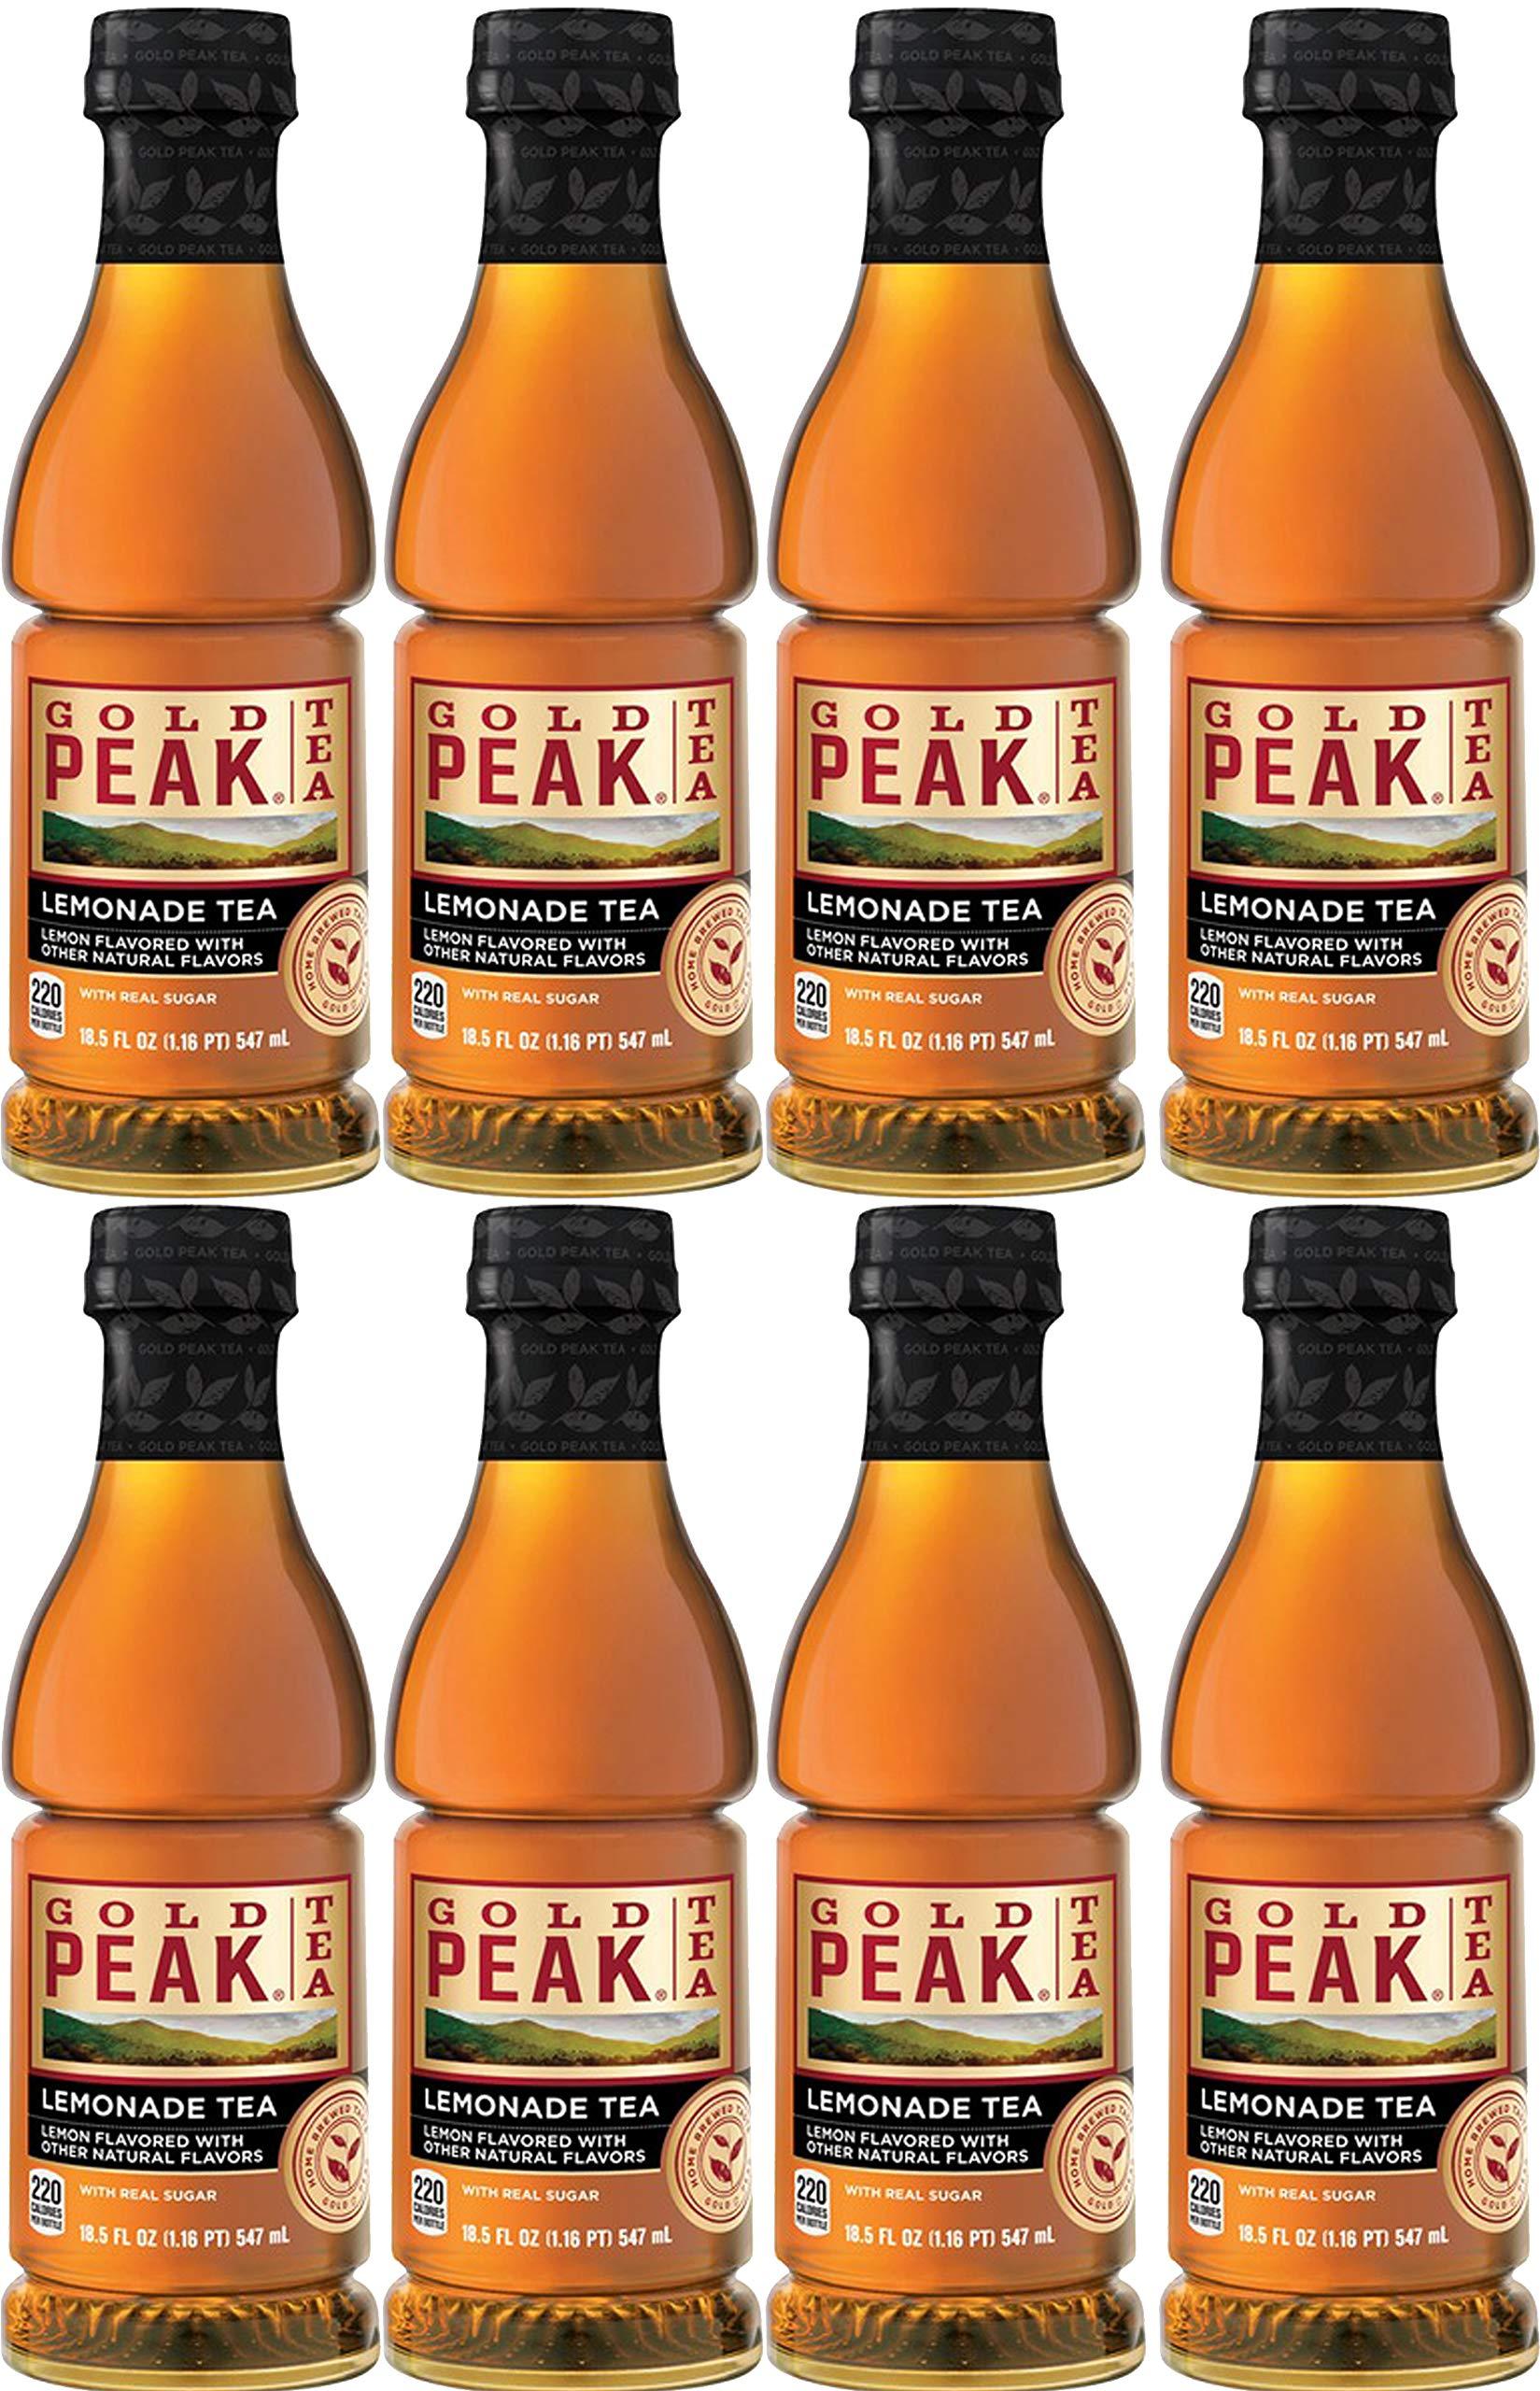 Gold Peak Tea, Lemonade Tea With Real Sugar, 18.5oz Bottle (Pack of 8, Total of 148 Oz)